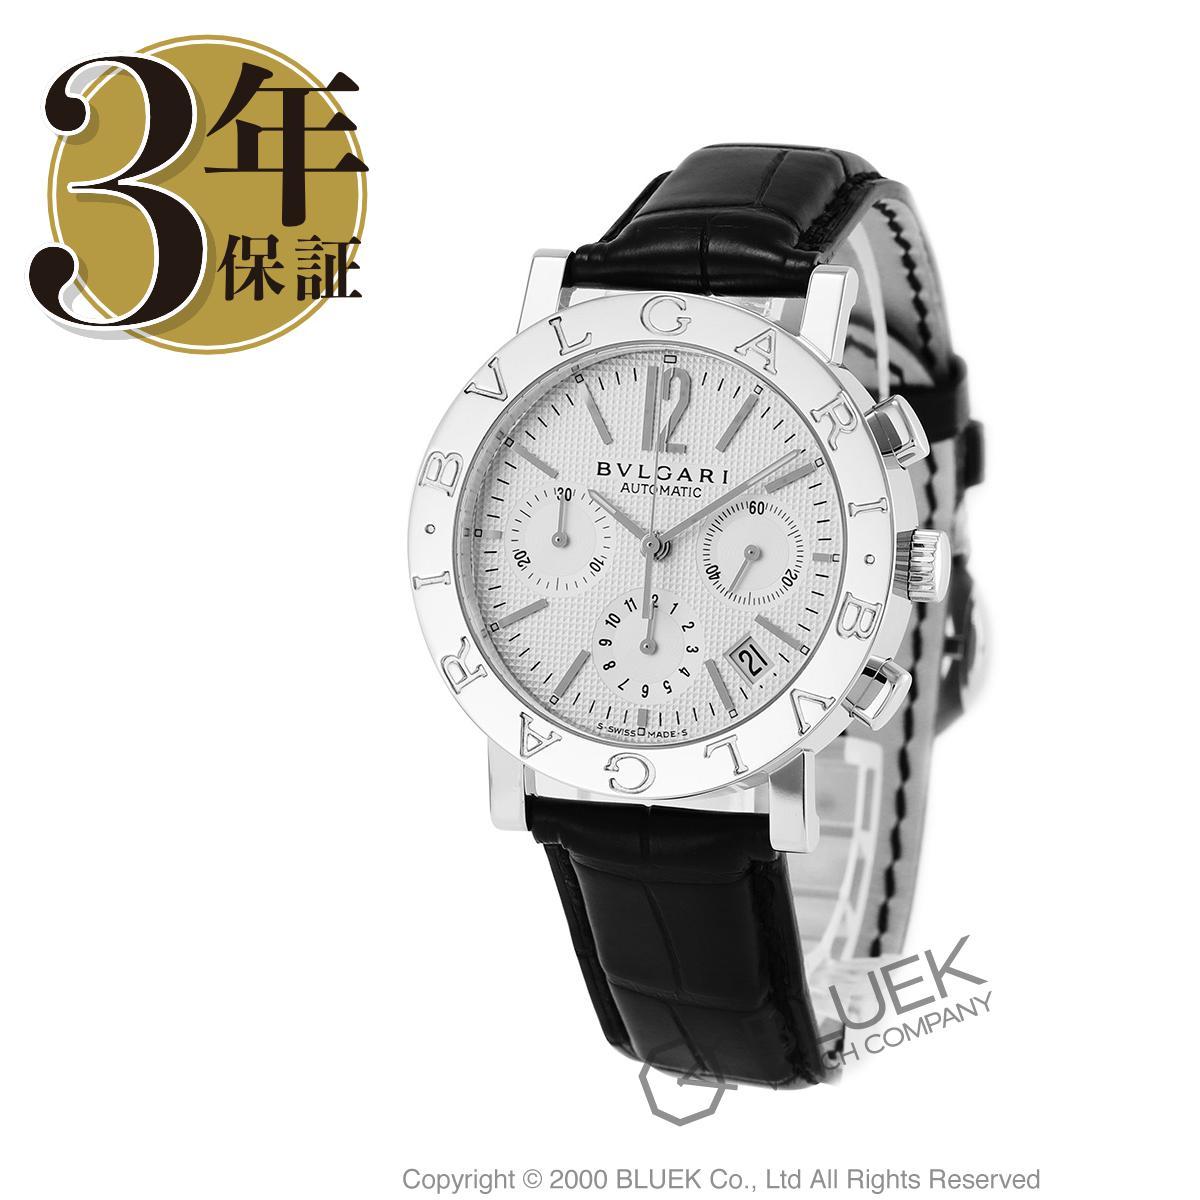 74fdff06661e ブルガリ BVLGARI 腕時計 ブルガリブルガリ アリゲーターレザー メンズ BB38WSLDCH_8